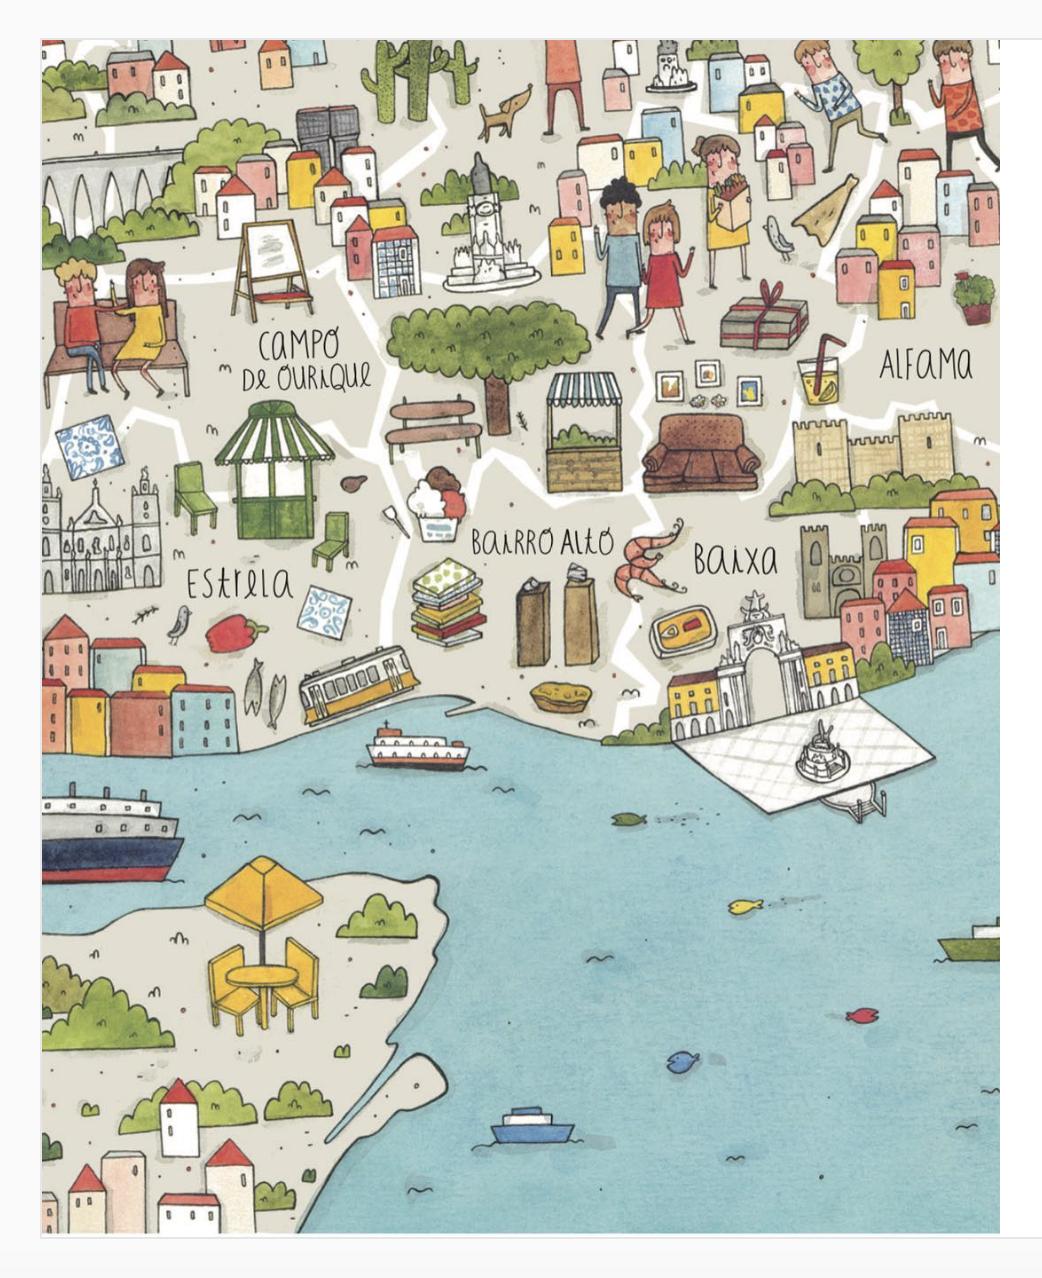 Lisbon, illustrated by Rafaela Rodrigues